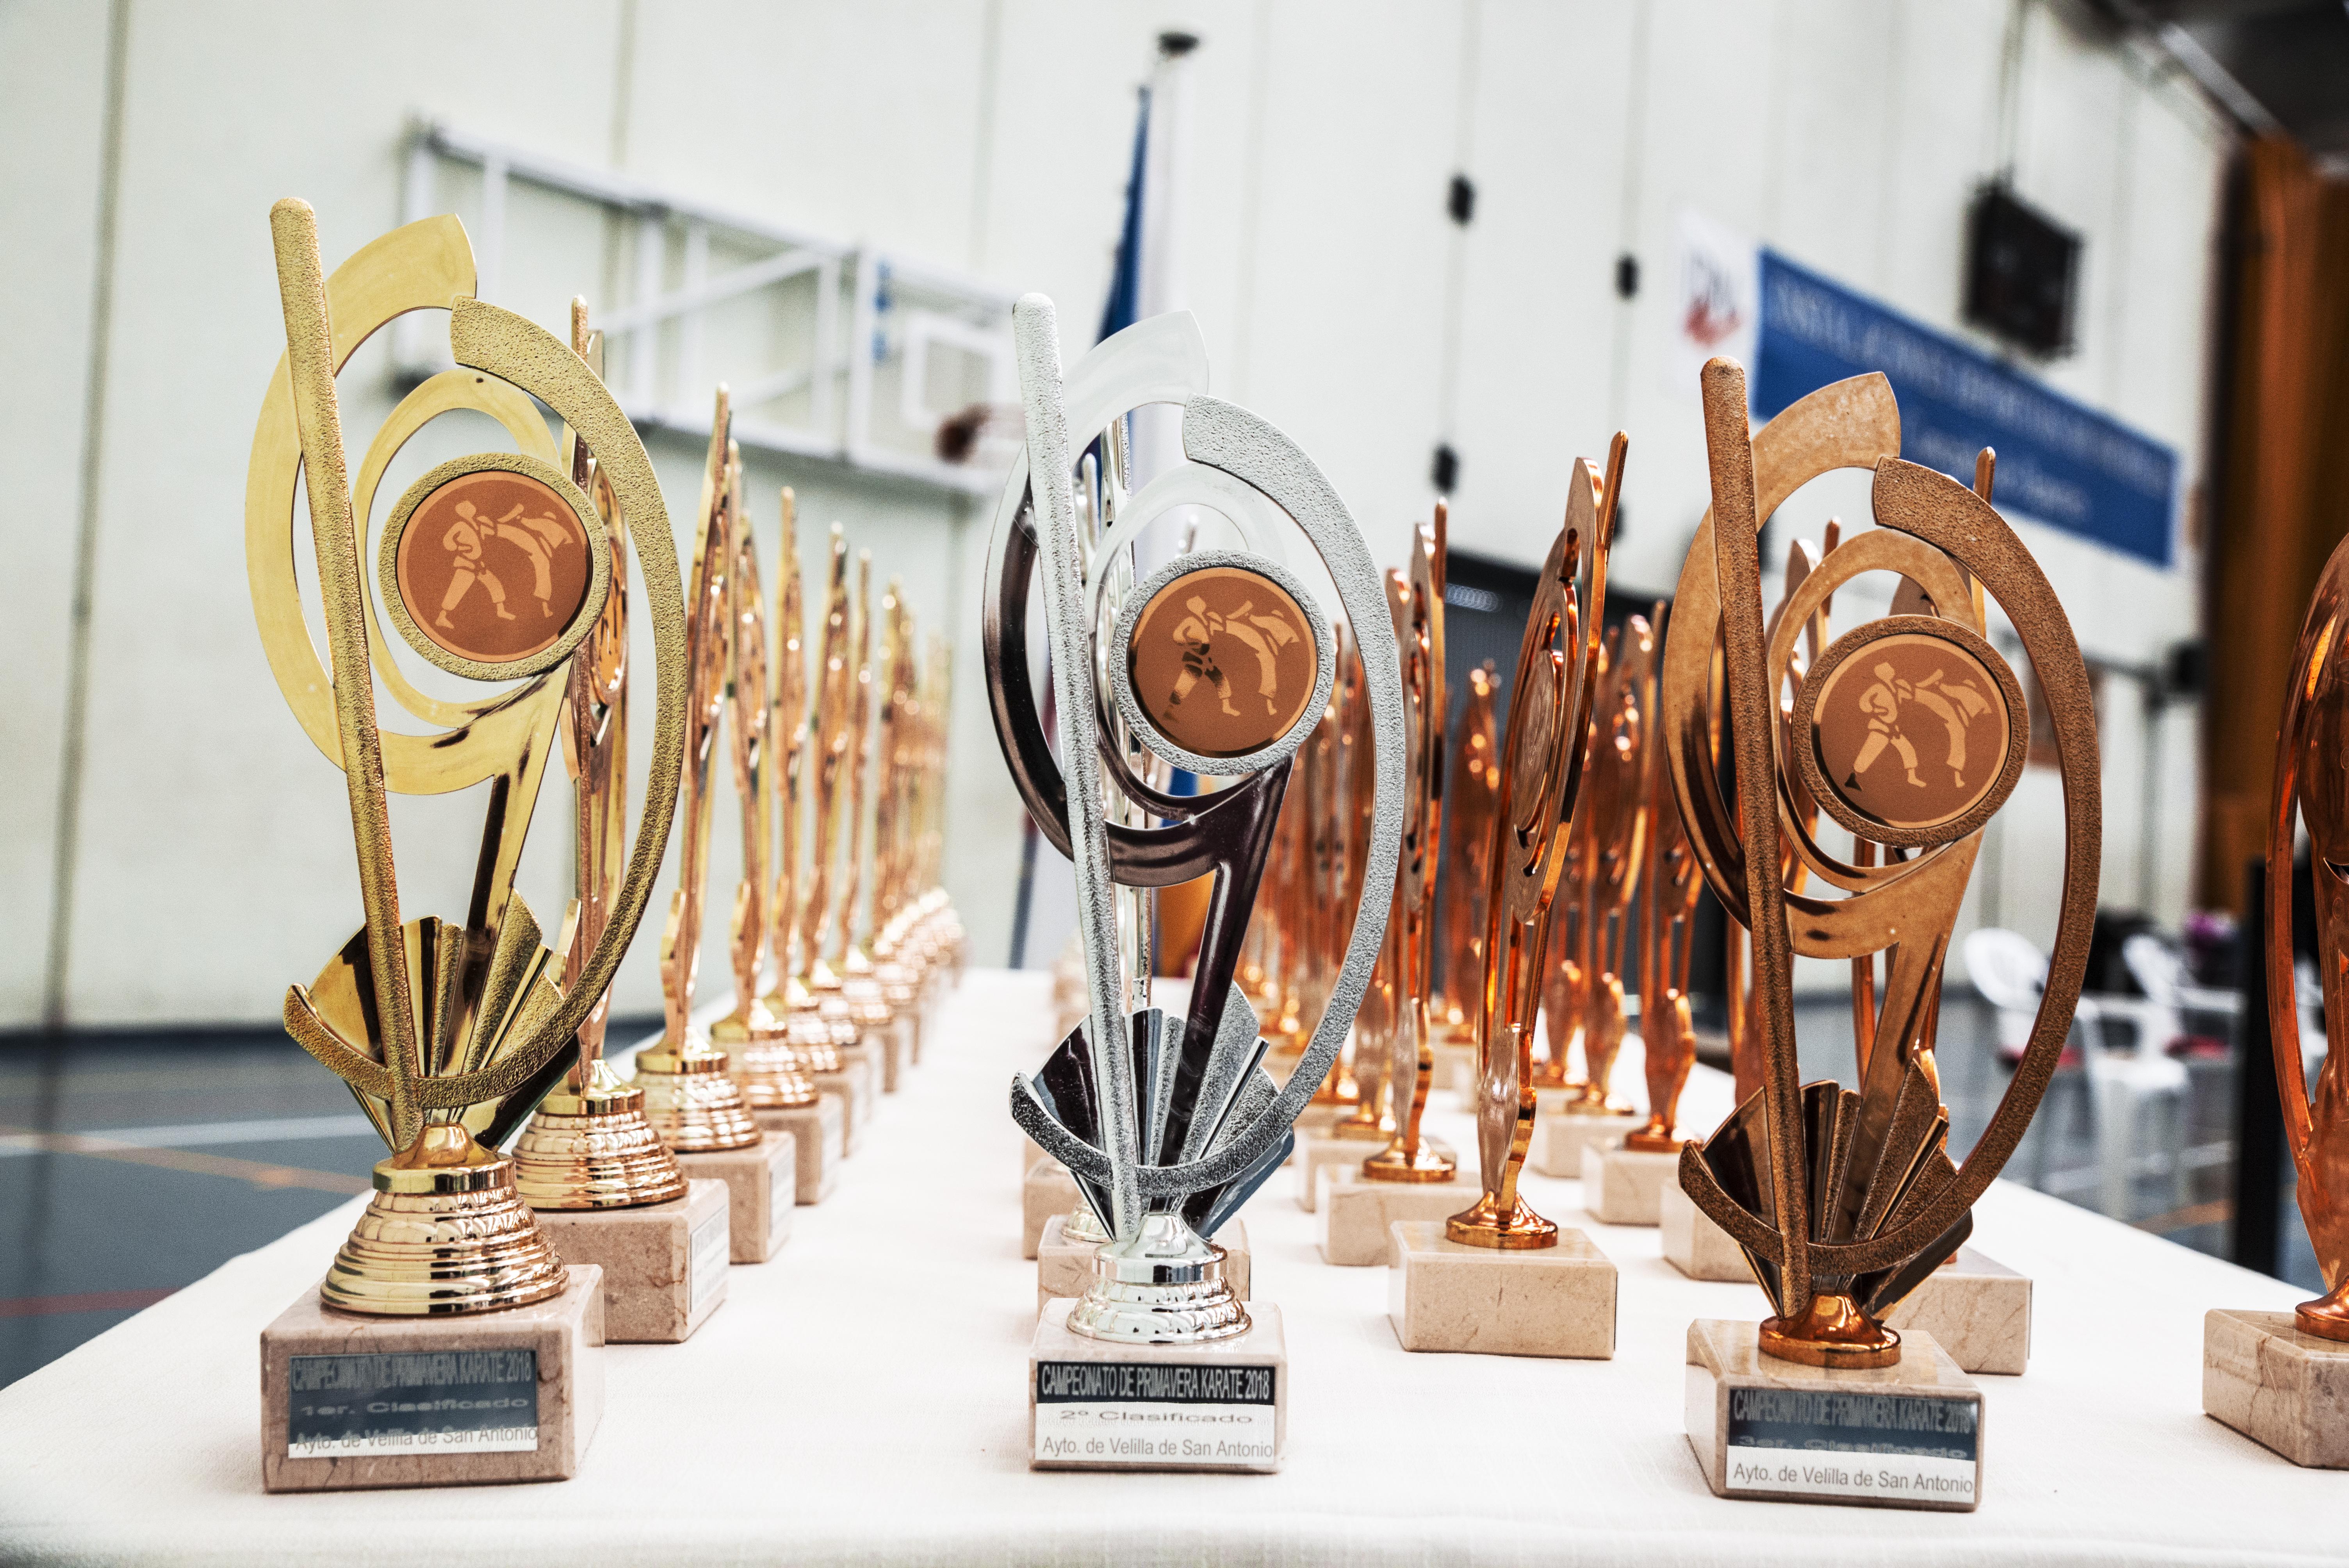 2018 Campeonato primavera karate